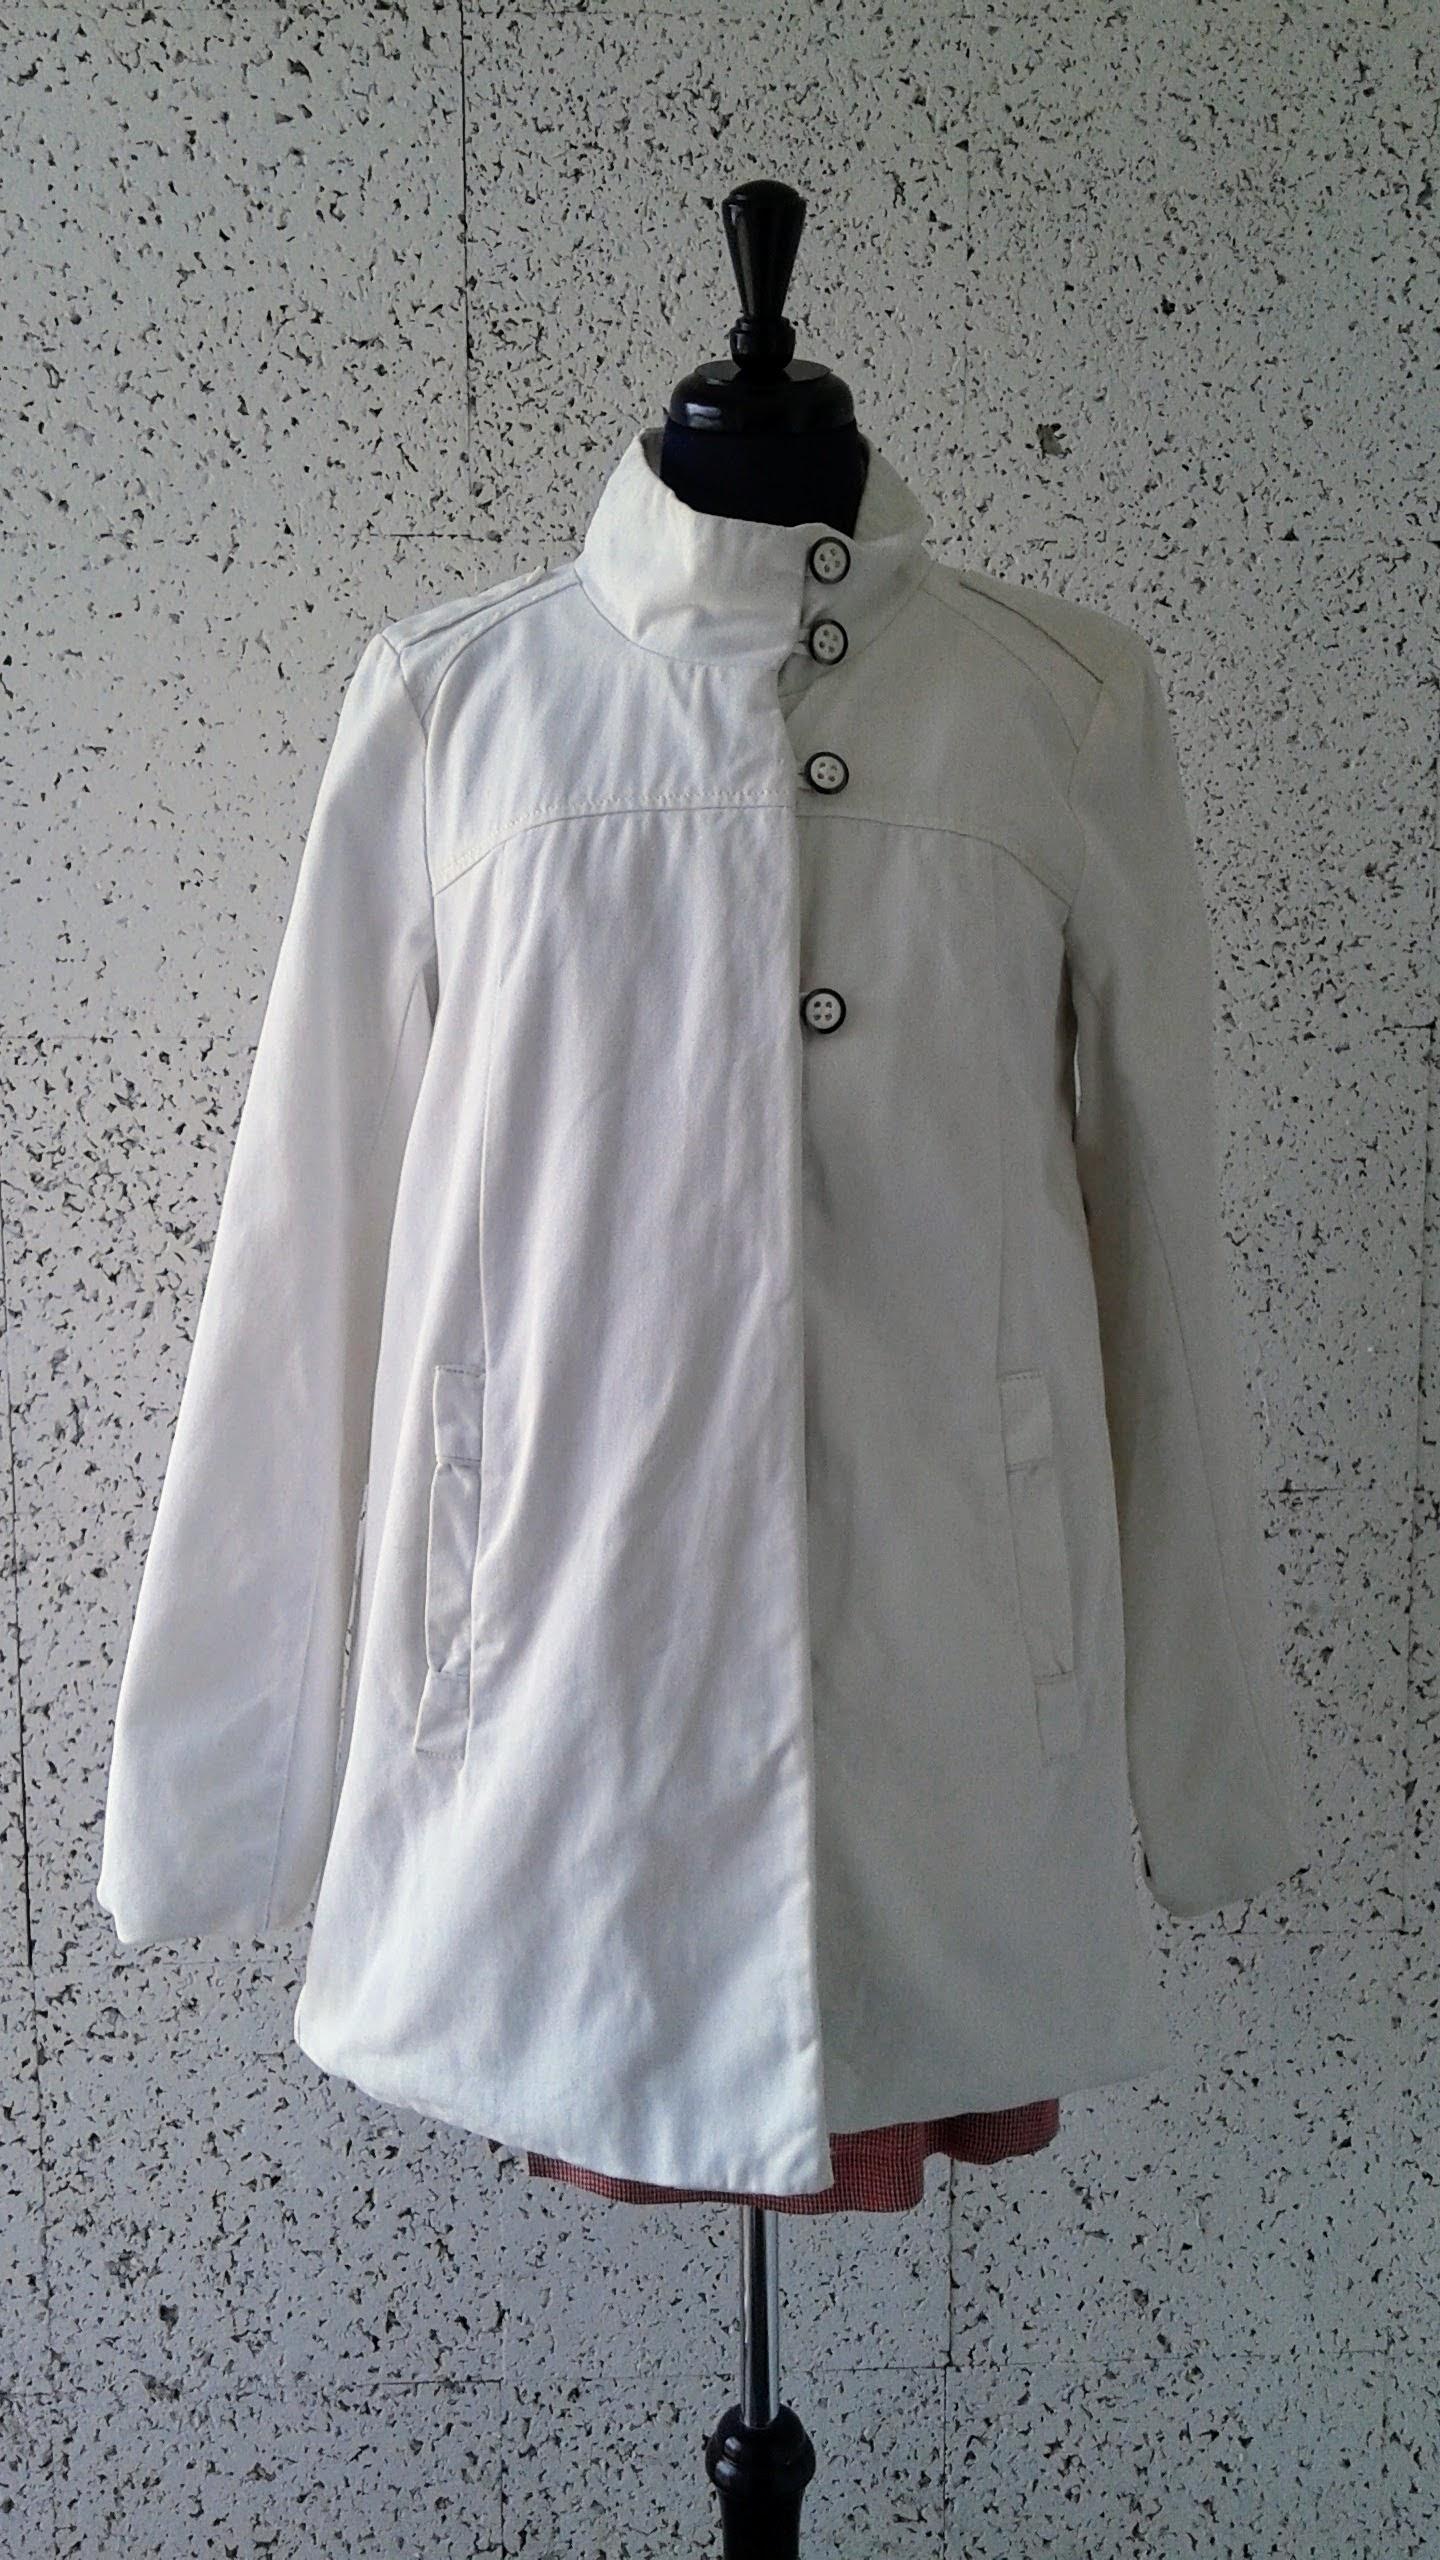 Vero Moda  coat; Size L, $42